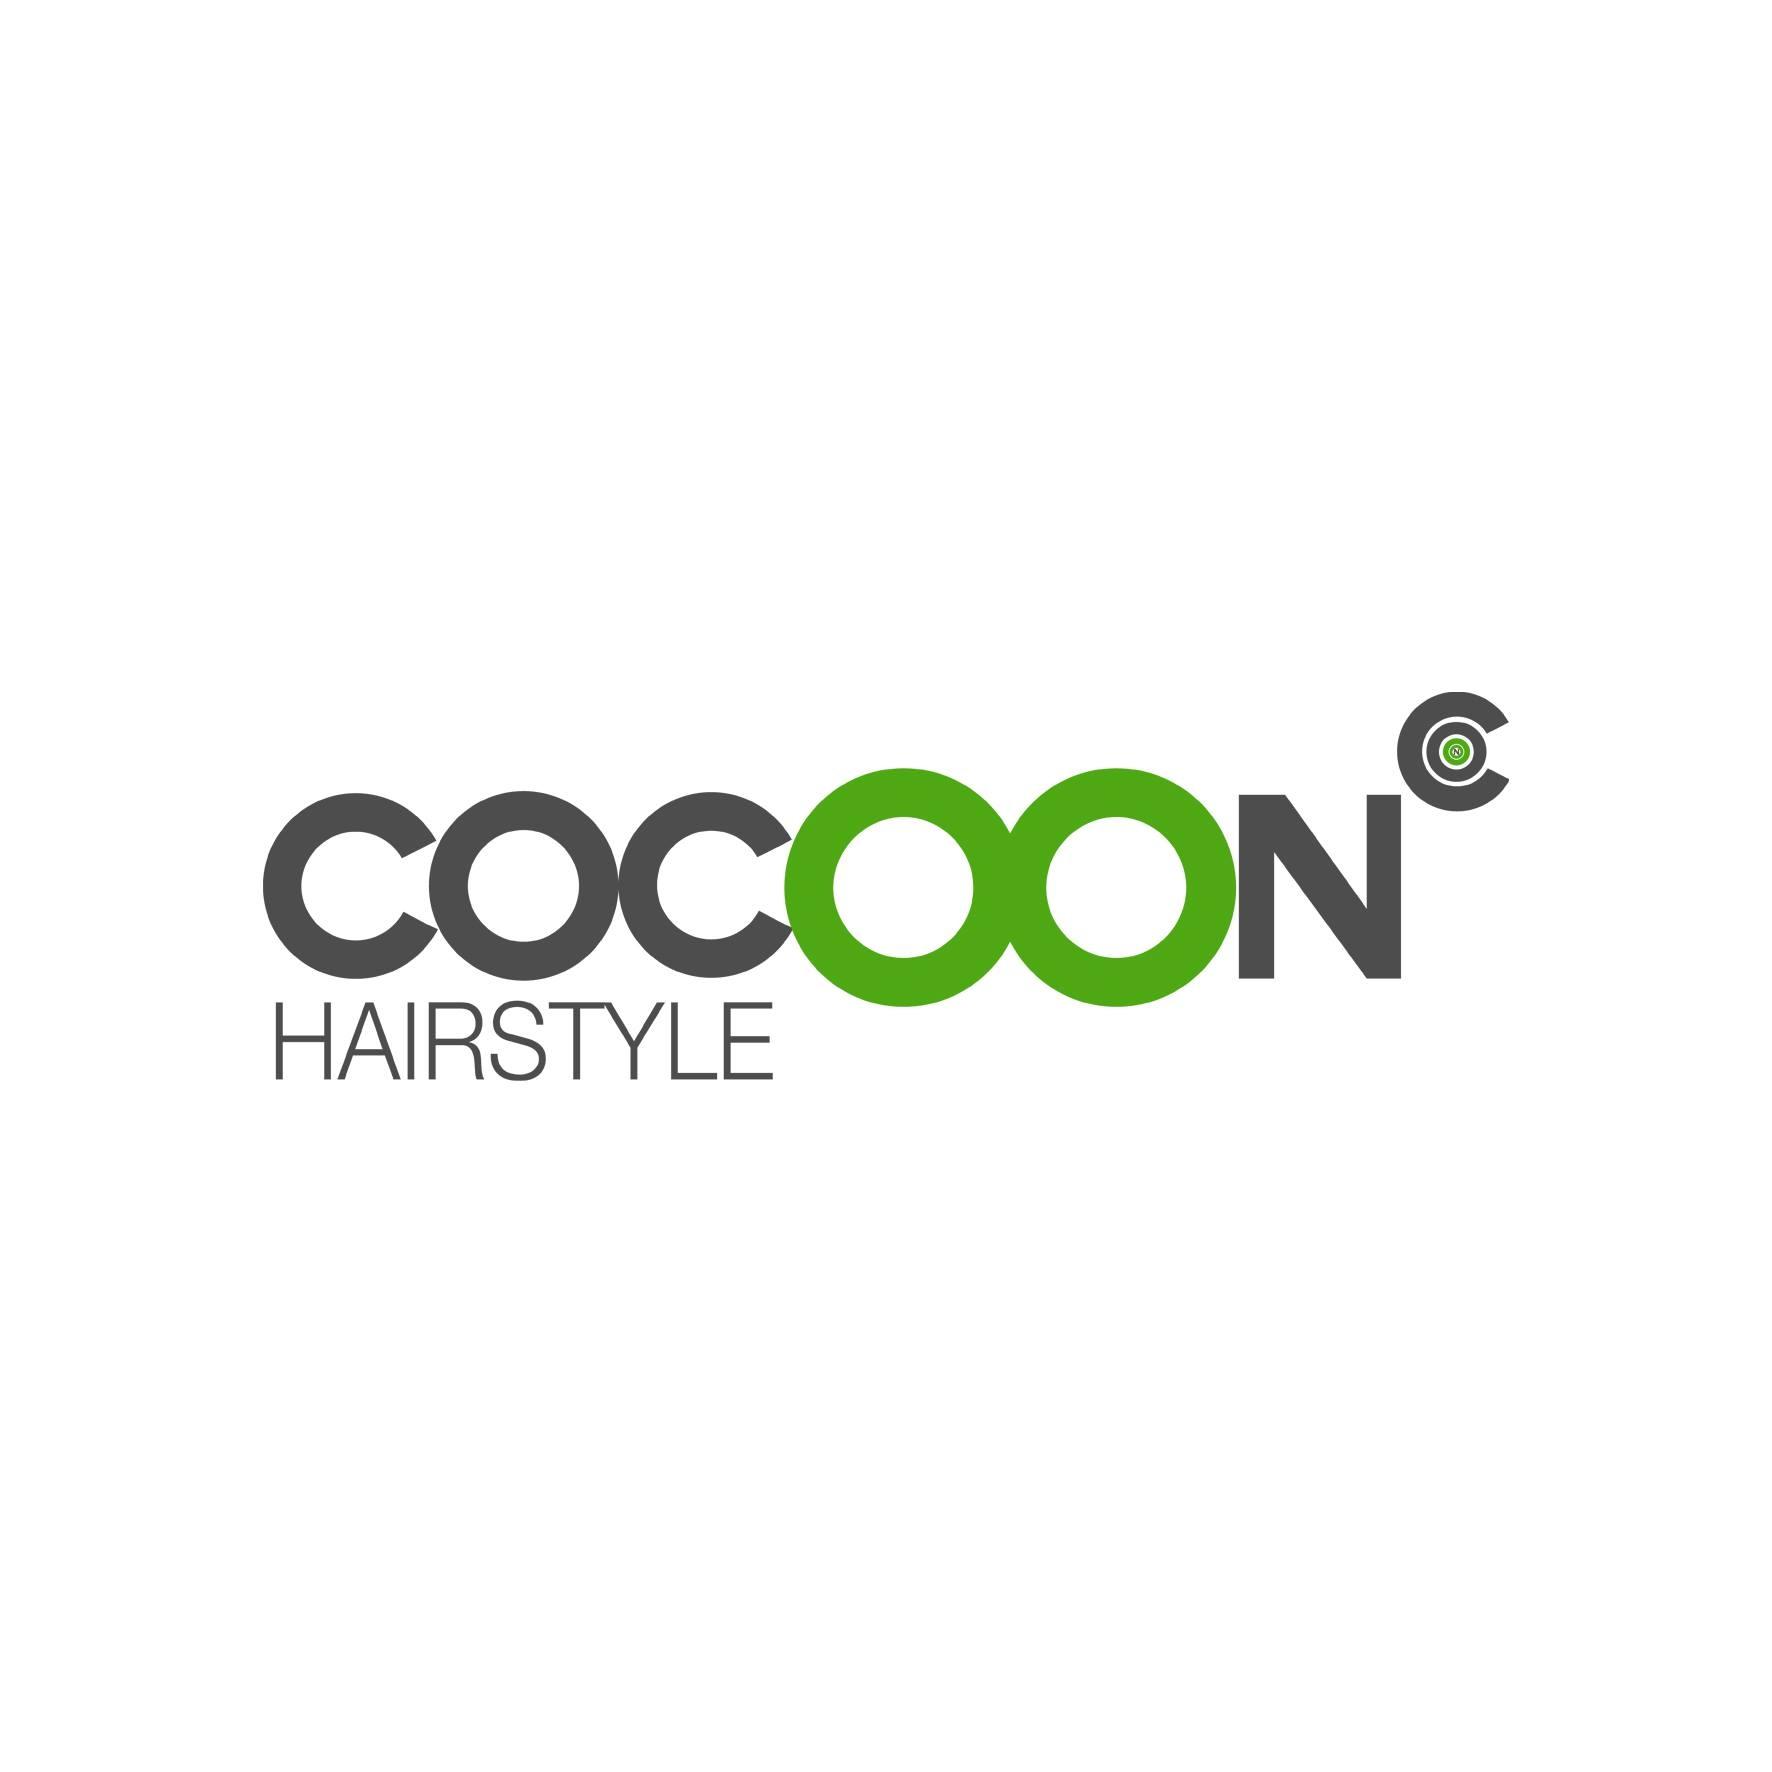 Bild zu COCOON HAIRSTYLE&BARBERSHOP in Balingen